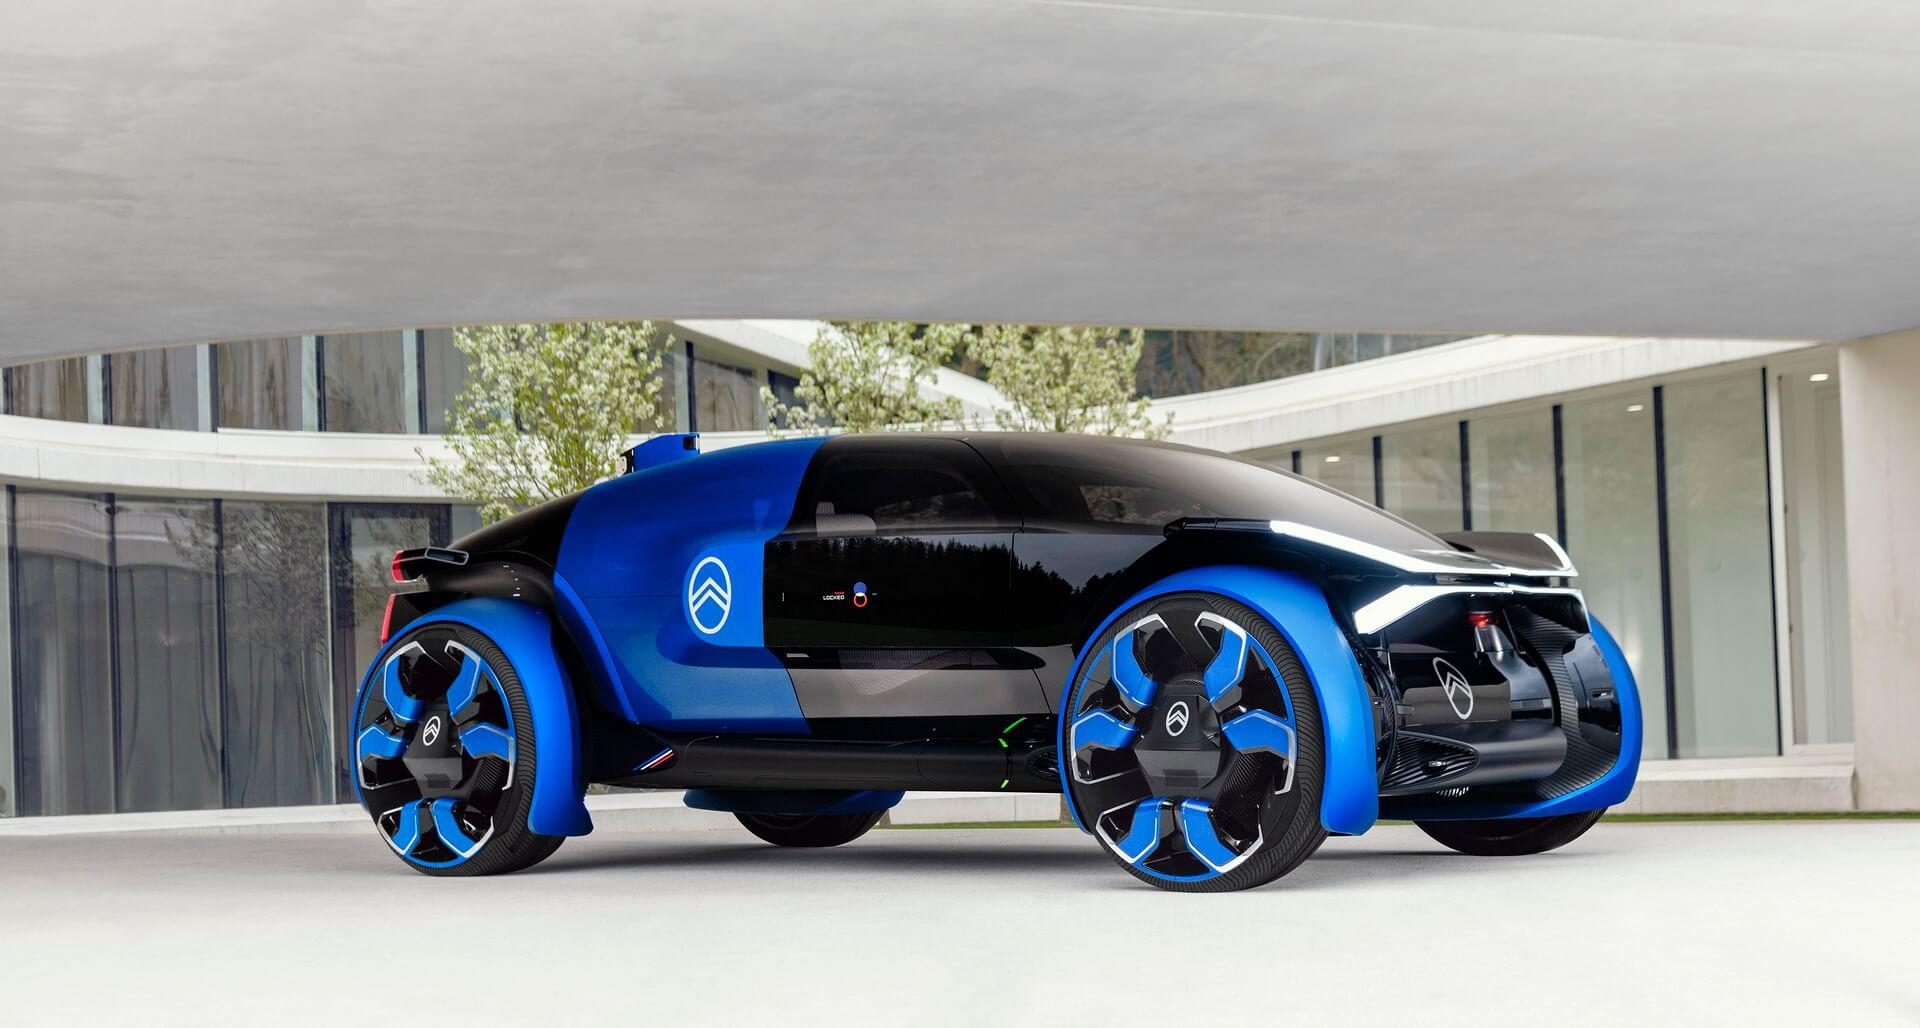 Citroën 19_19 — электрокар будущего сзапасом хода 800км